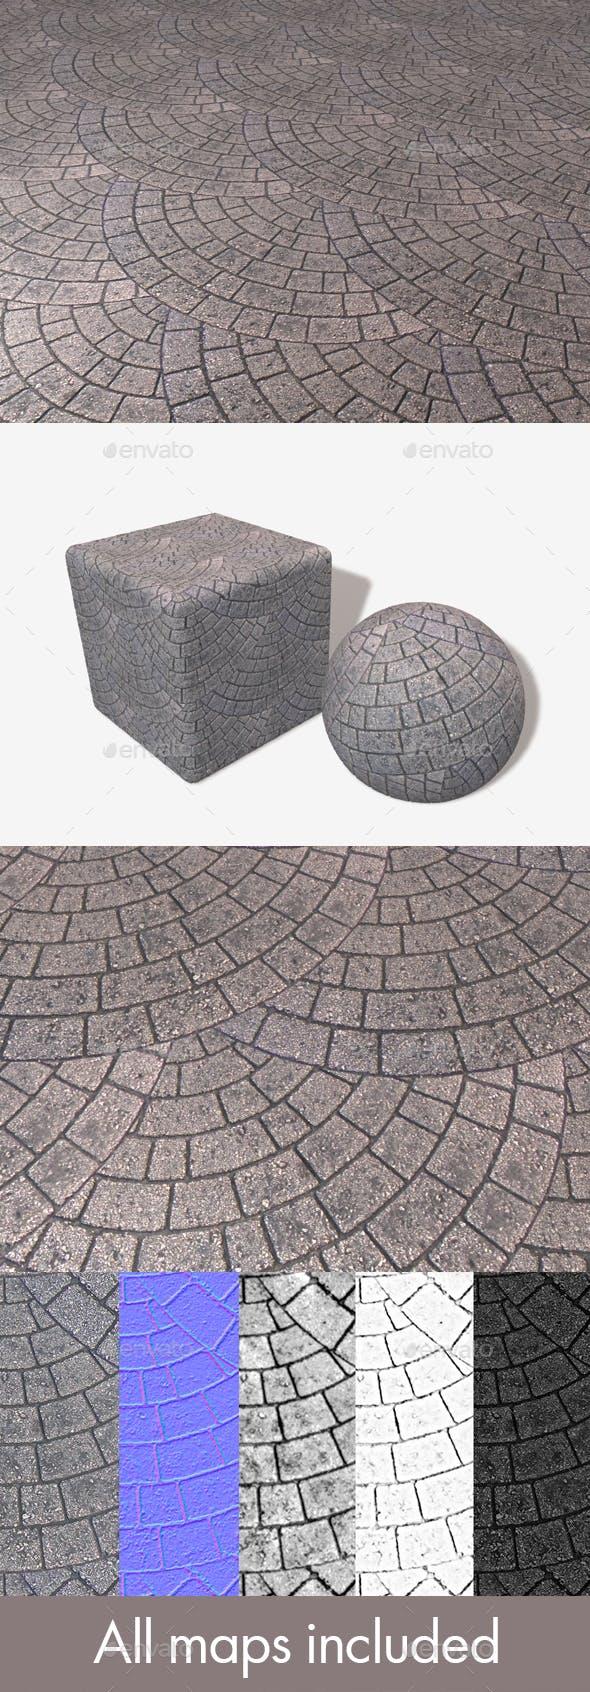 Brick Paving Circle Pattern Seamless Texture - 3DOcean Item for Sale